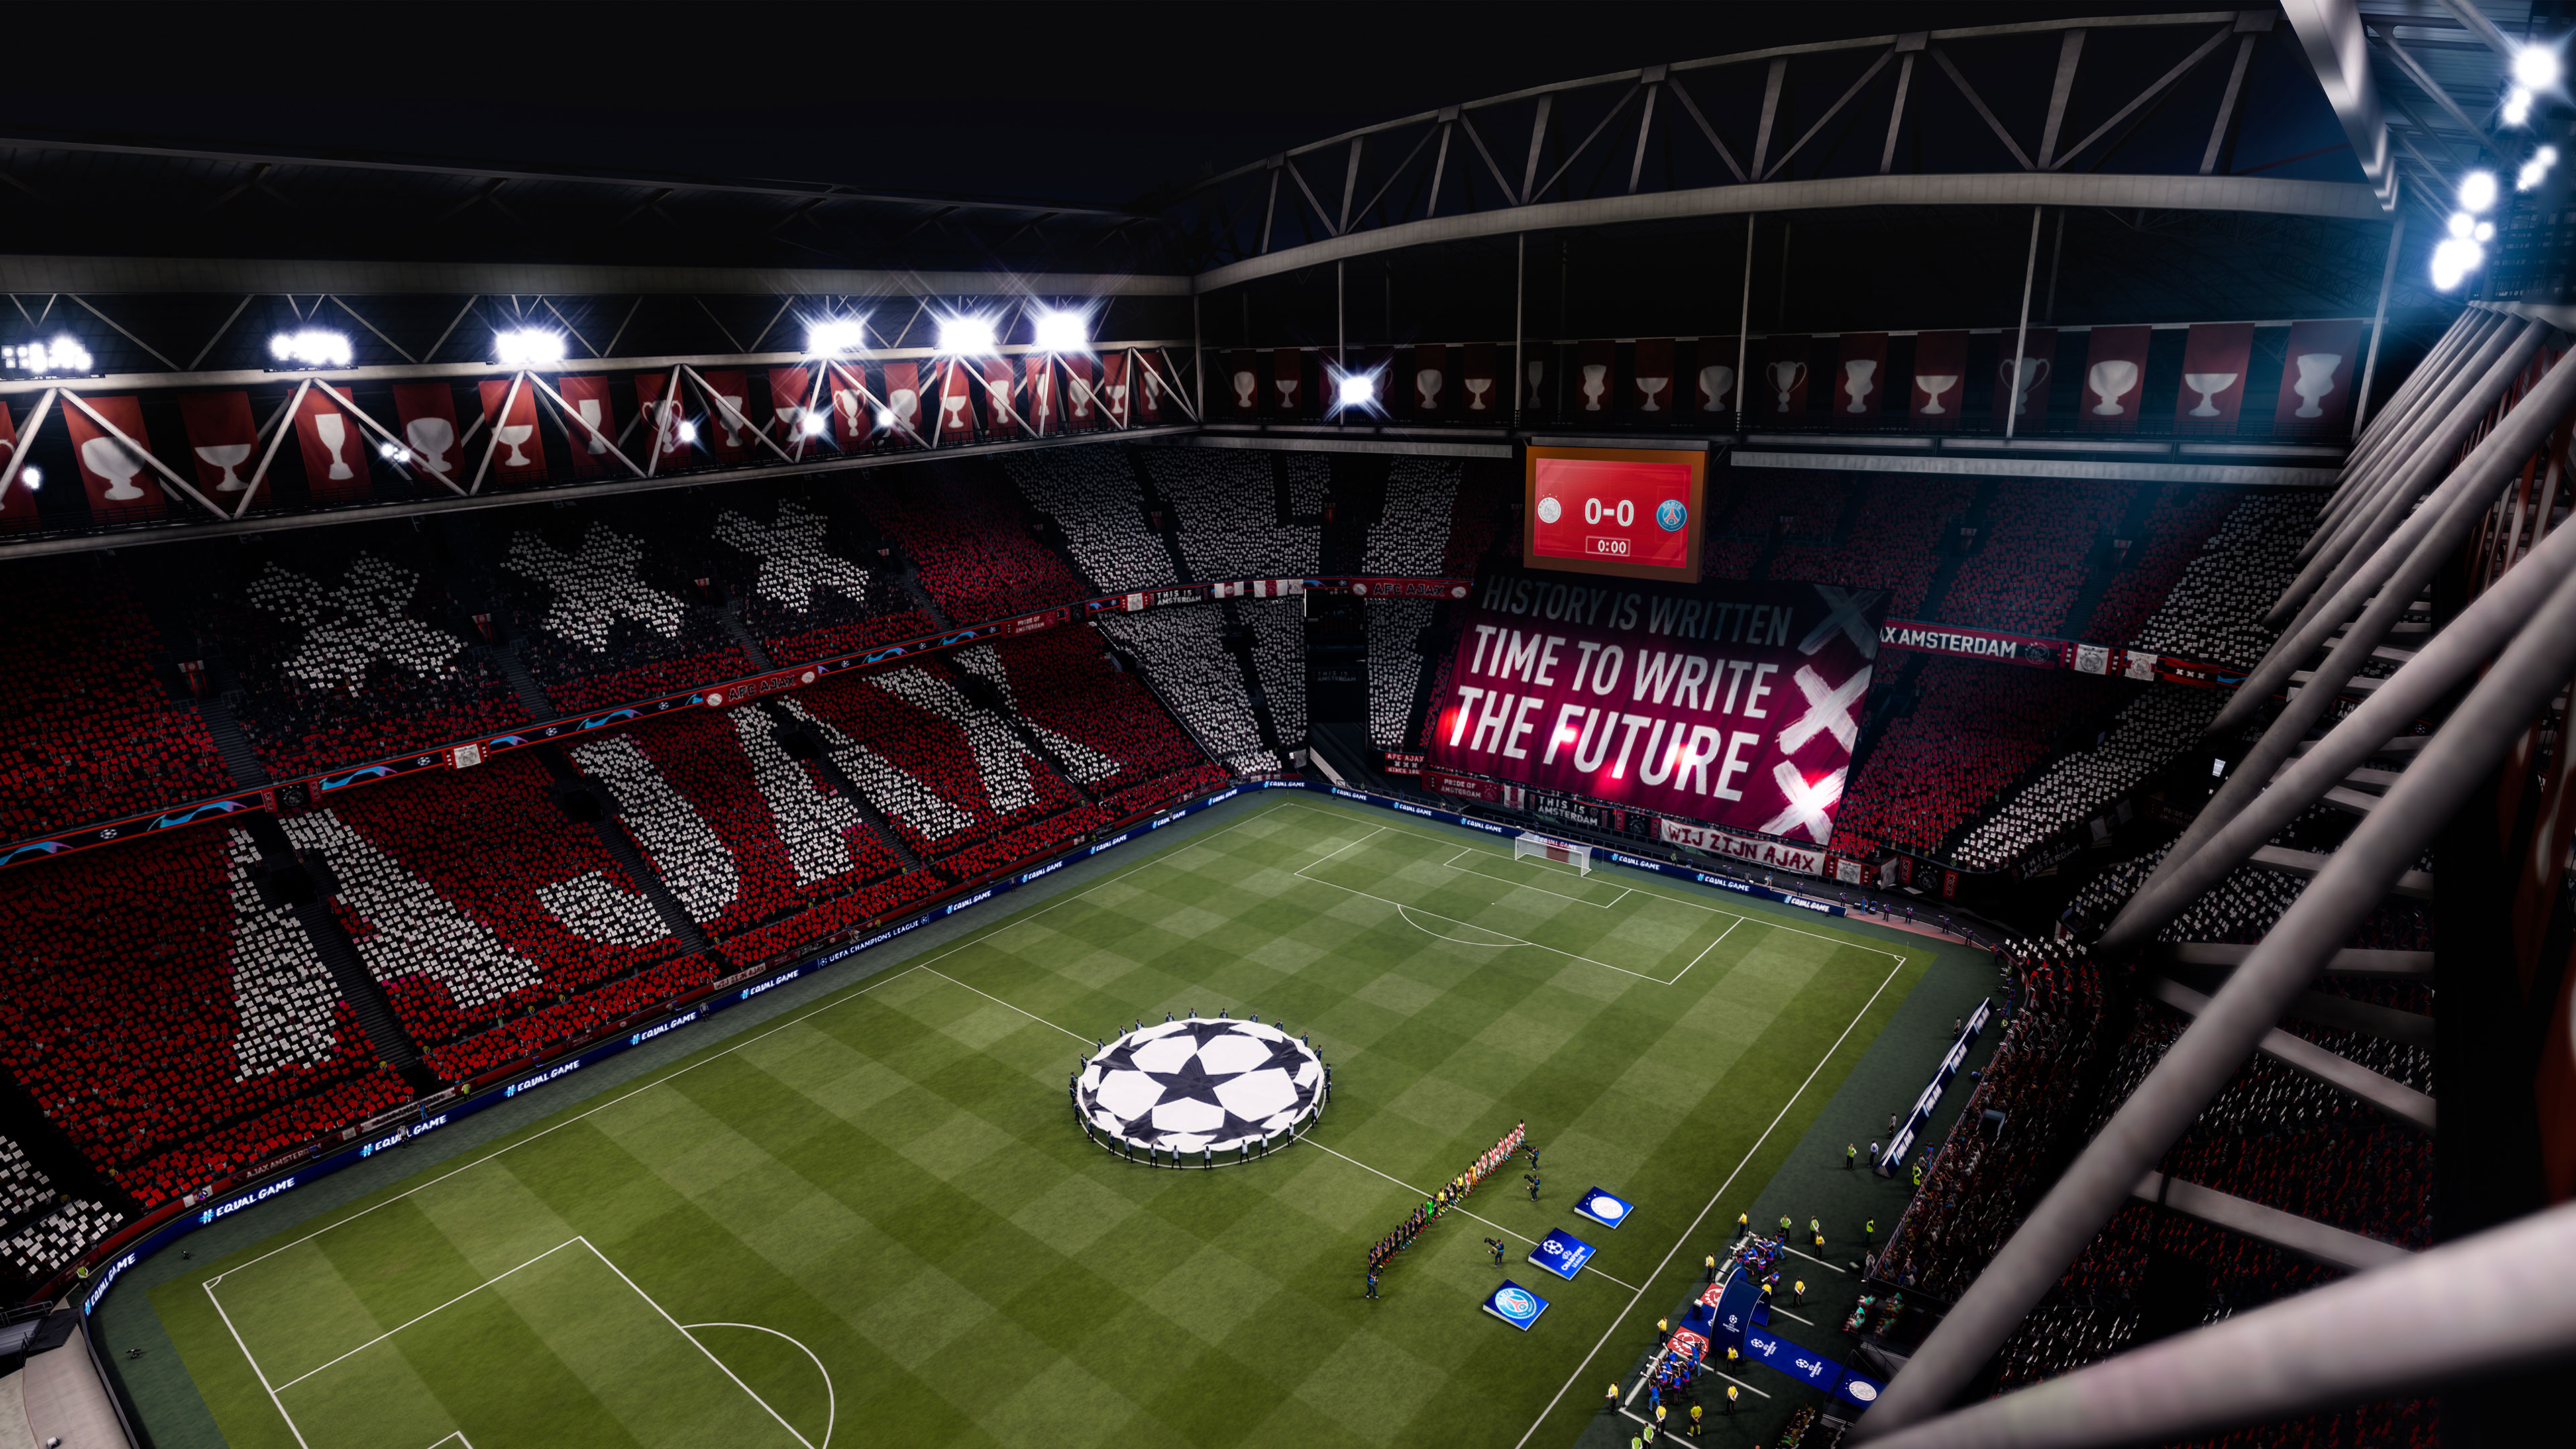 Скриншот №3 к FIFA 21 издание Champions PS4 and PS5